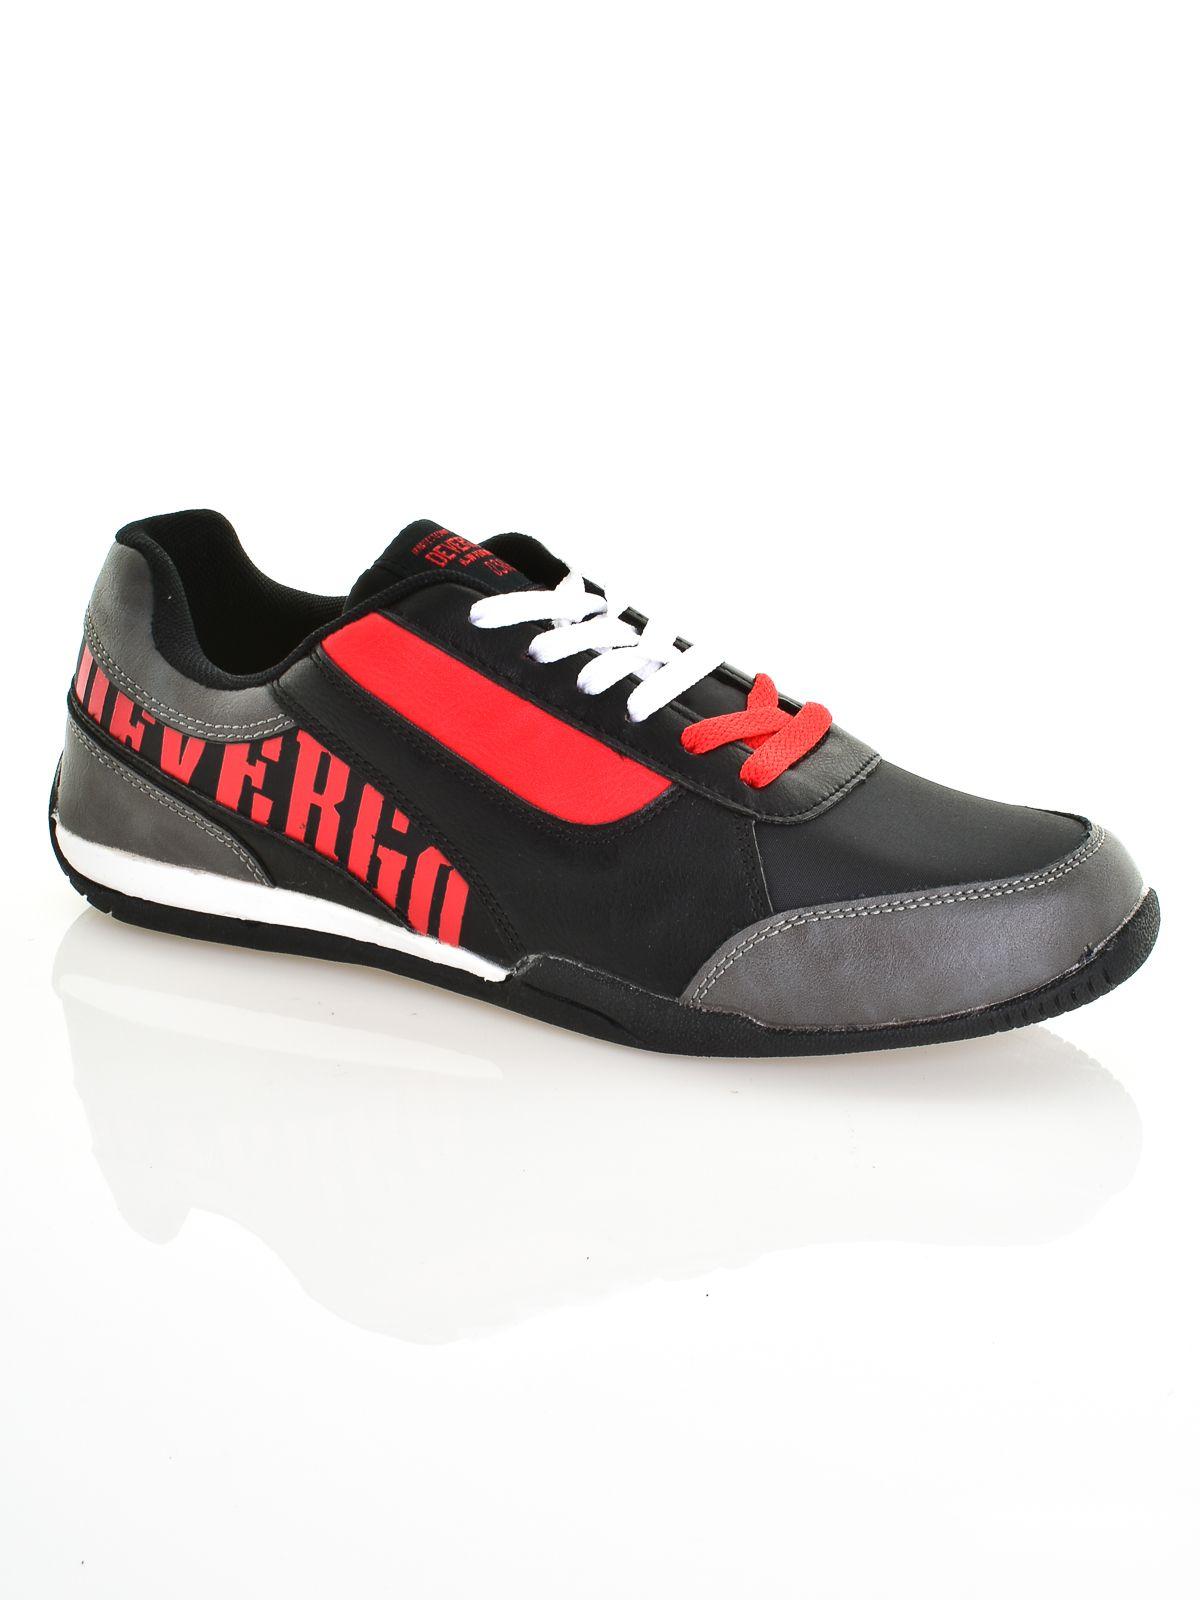 Férfi - Cipő - Utcai cipő Dorko 8e8ec90489